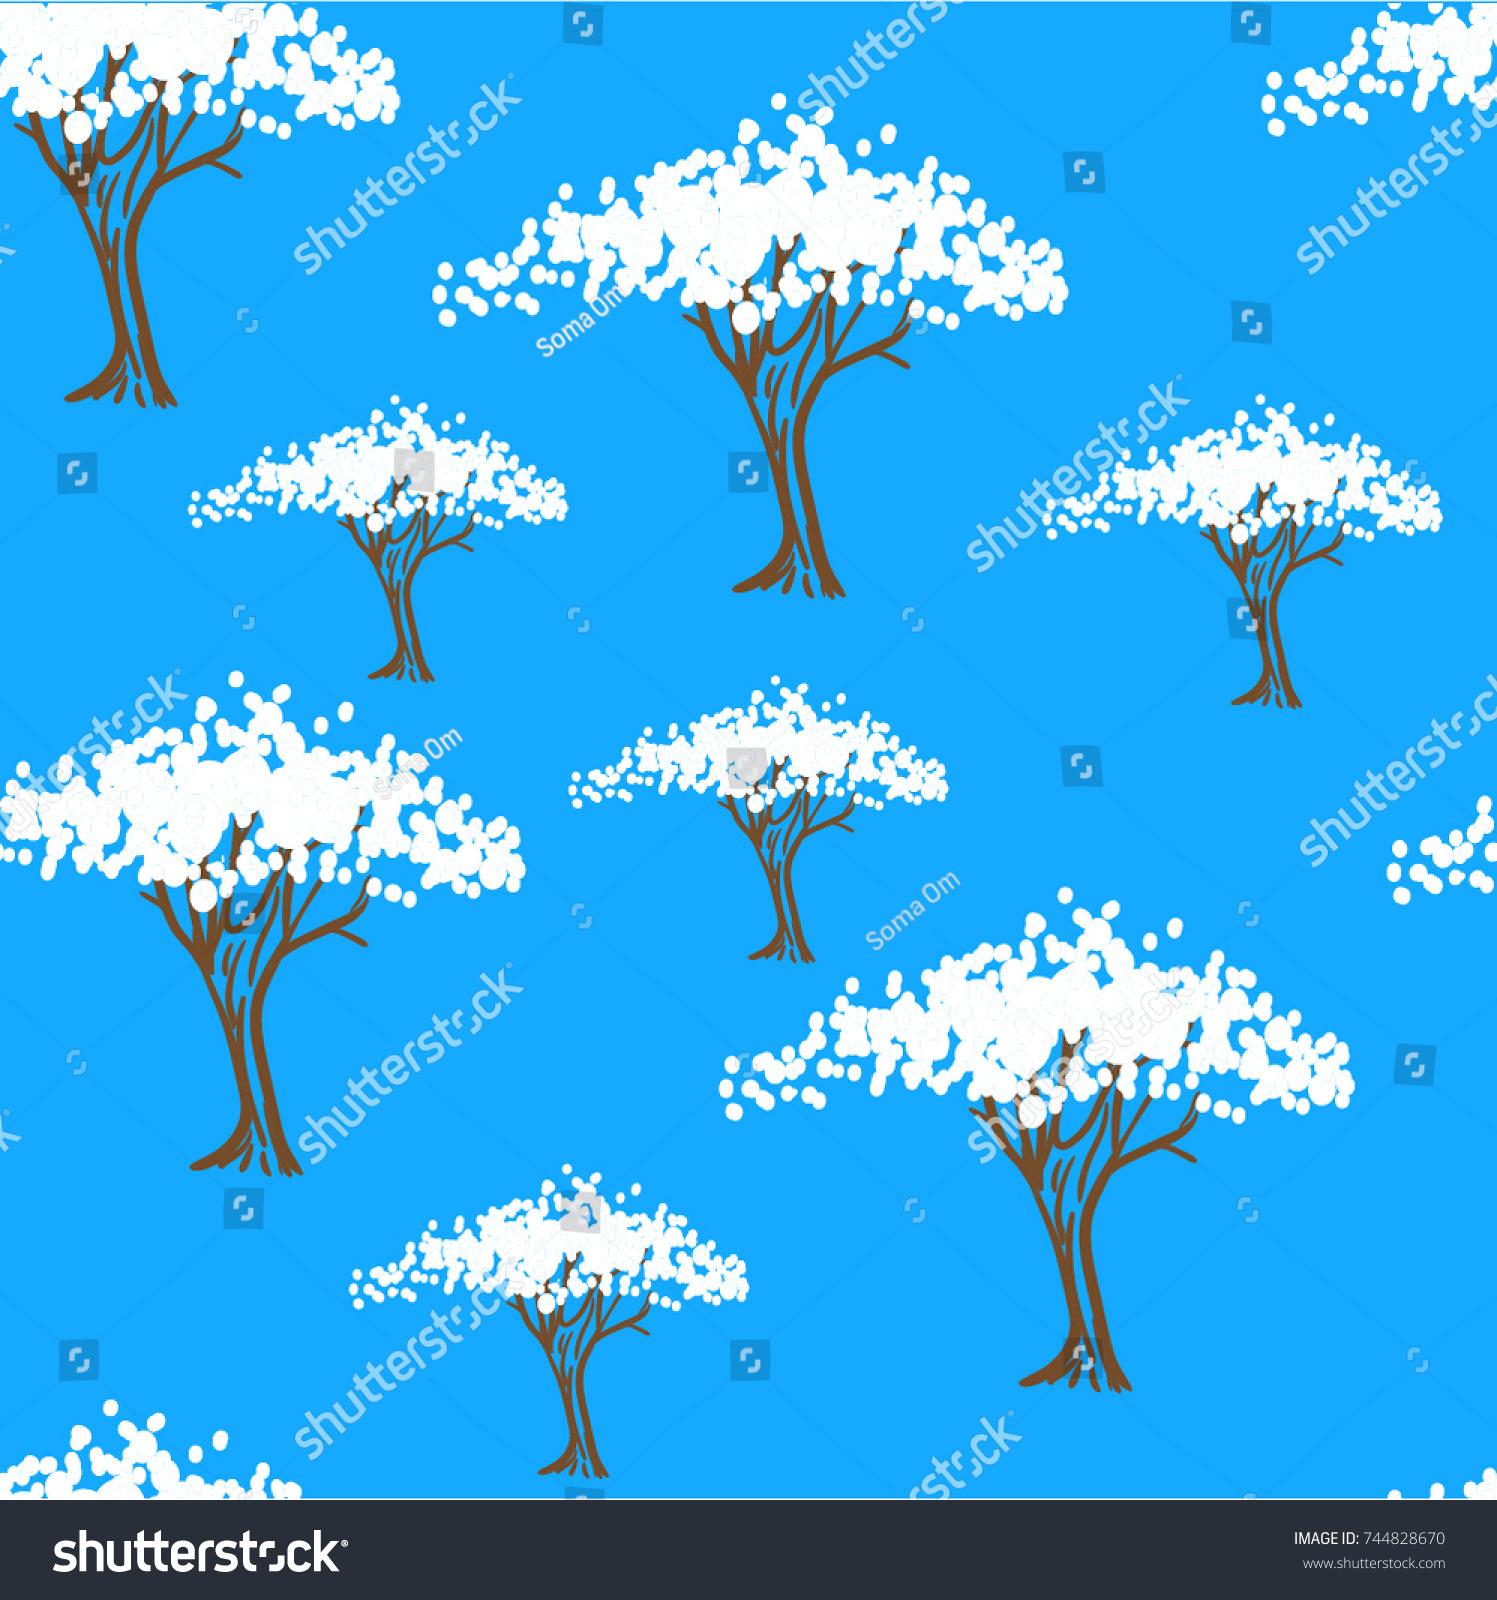 White flowering trees on blue background stock photo photo vector white flowering trees on a blue background stylized blooming trees garden spring izmirmasajfo